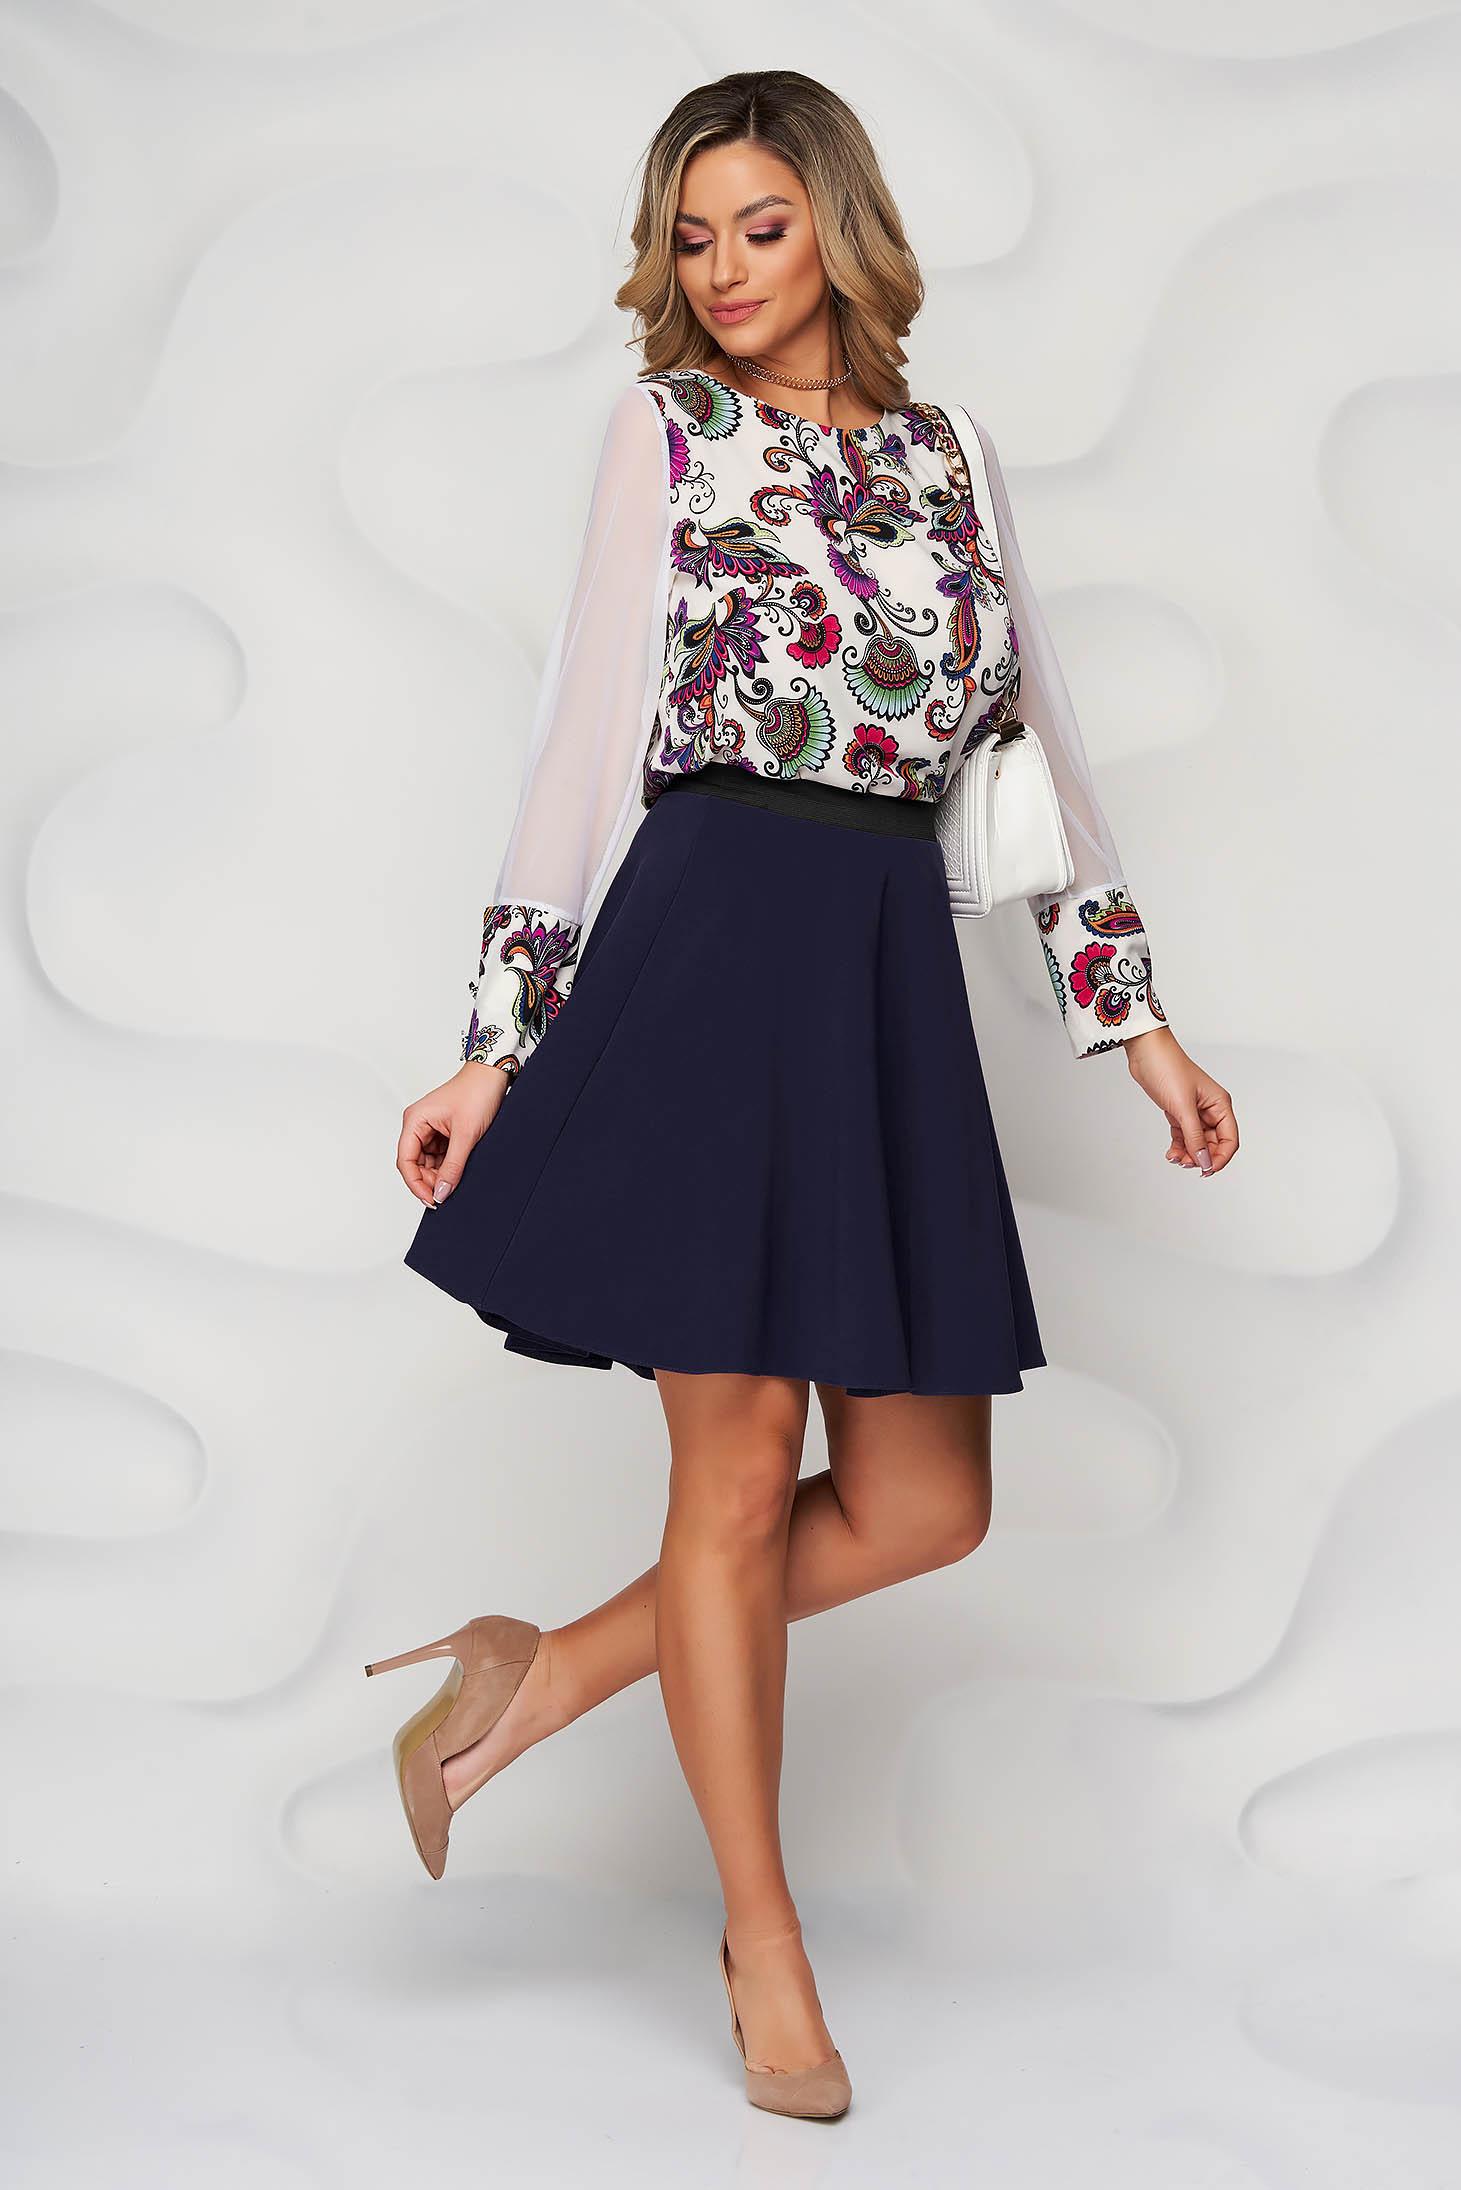 StarShinerS darkblue skirt cloche with elastic waist cloth short cut office